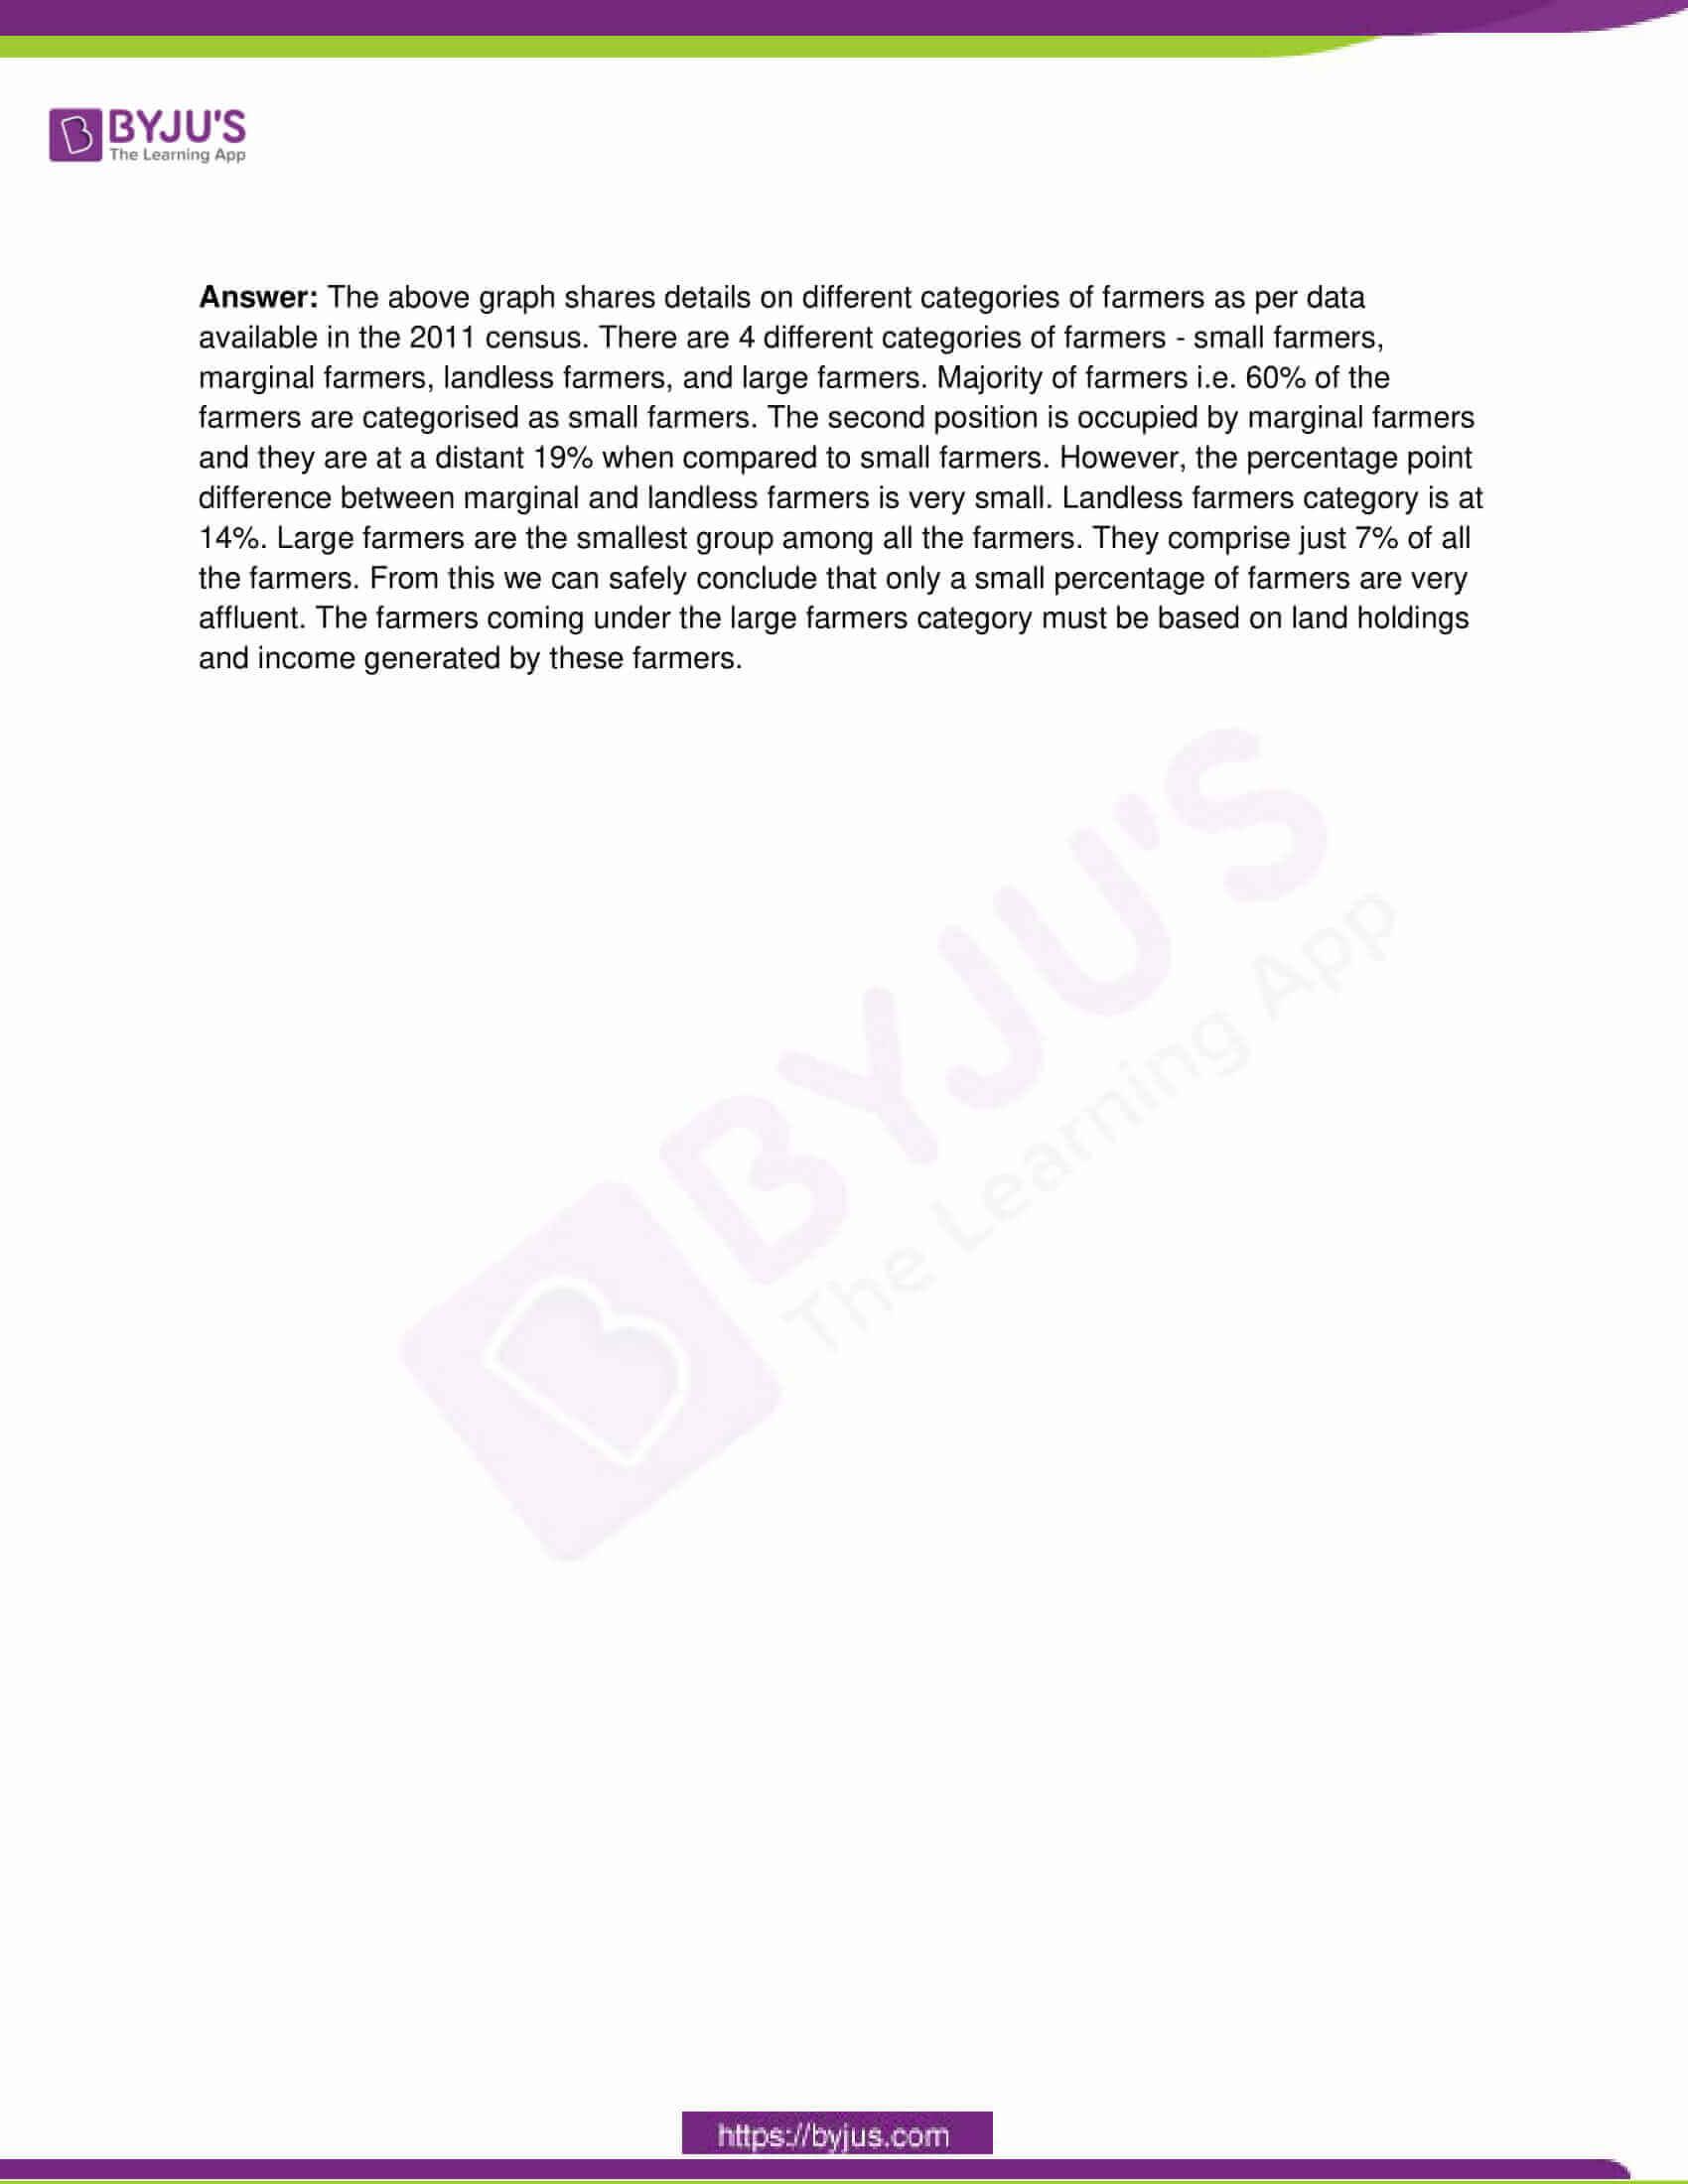 telangana board class 10 social science 2019 paper 1 solutions 8